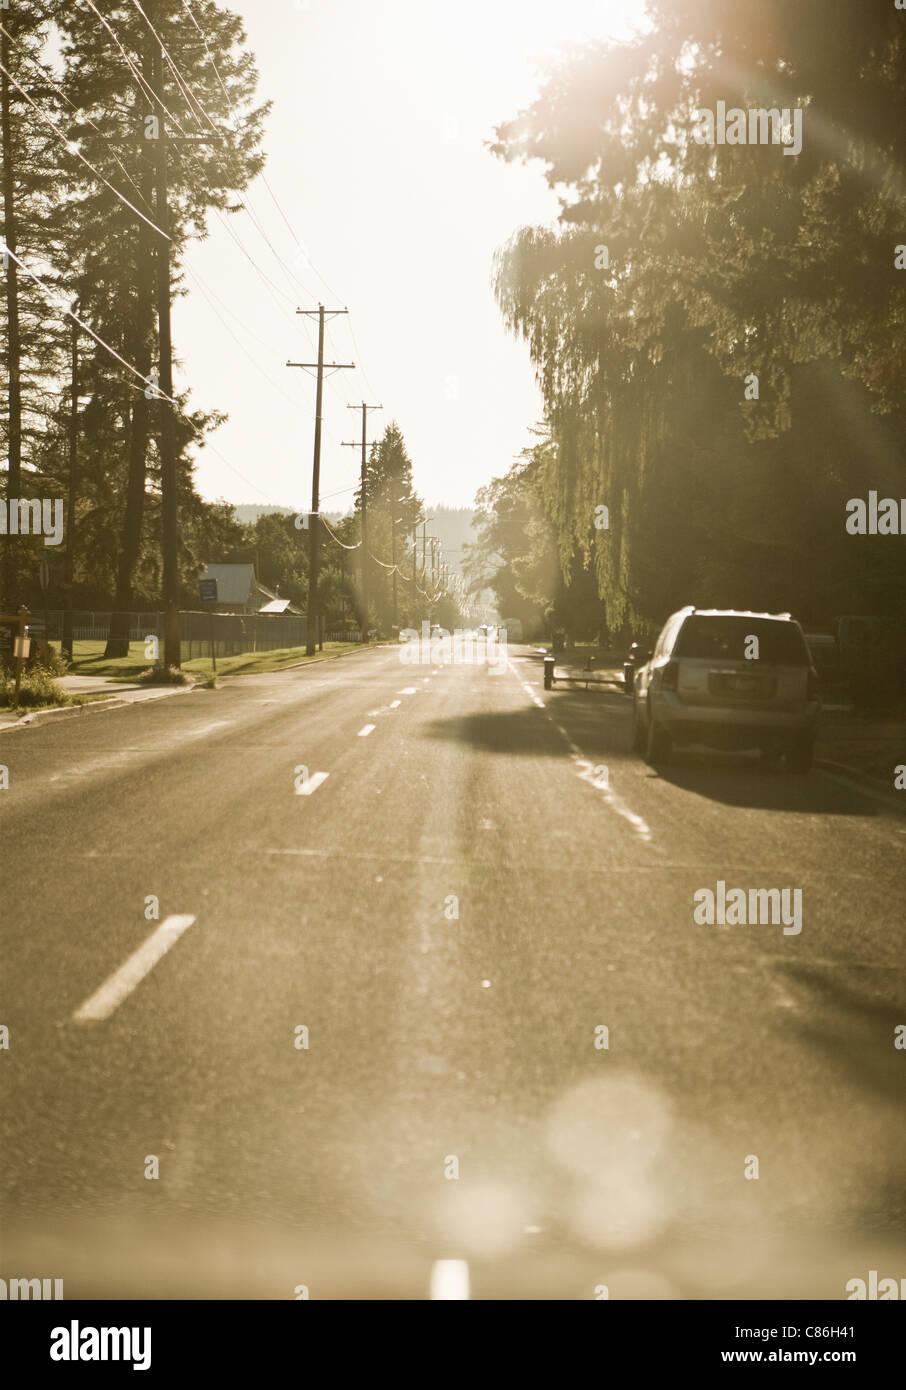 Cars parked on suburban street - Stock Image